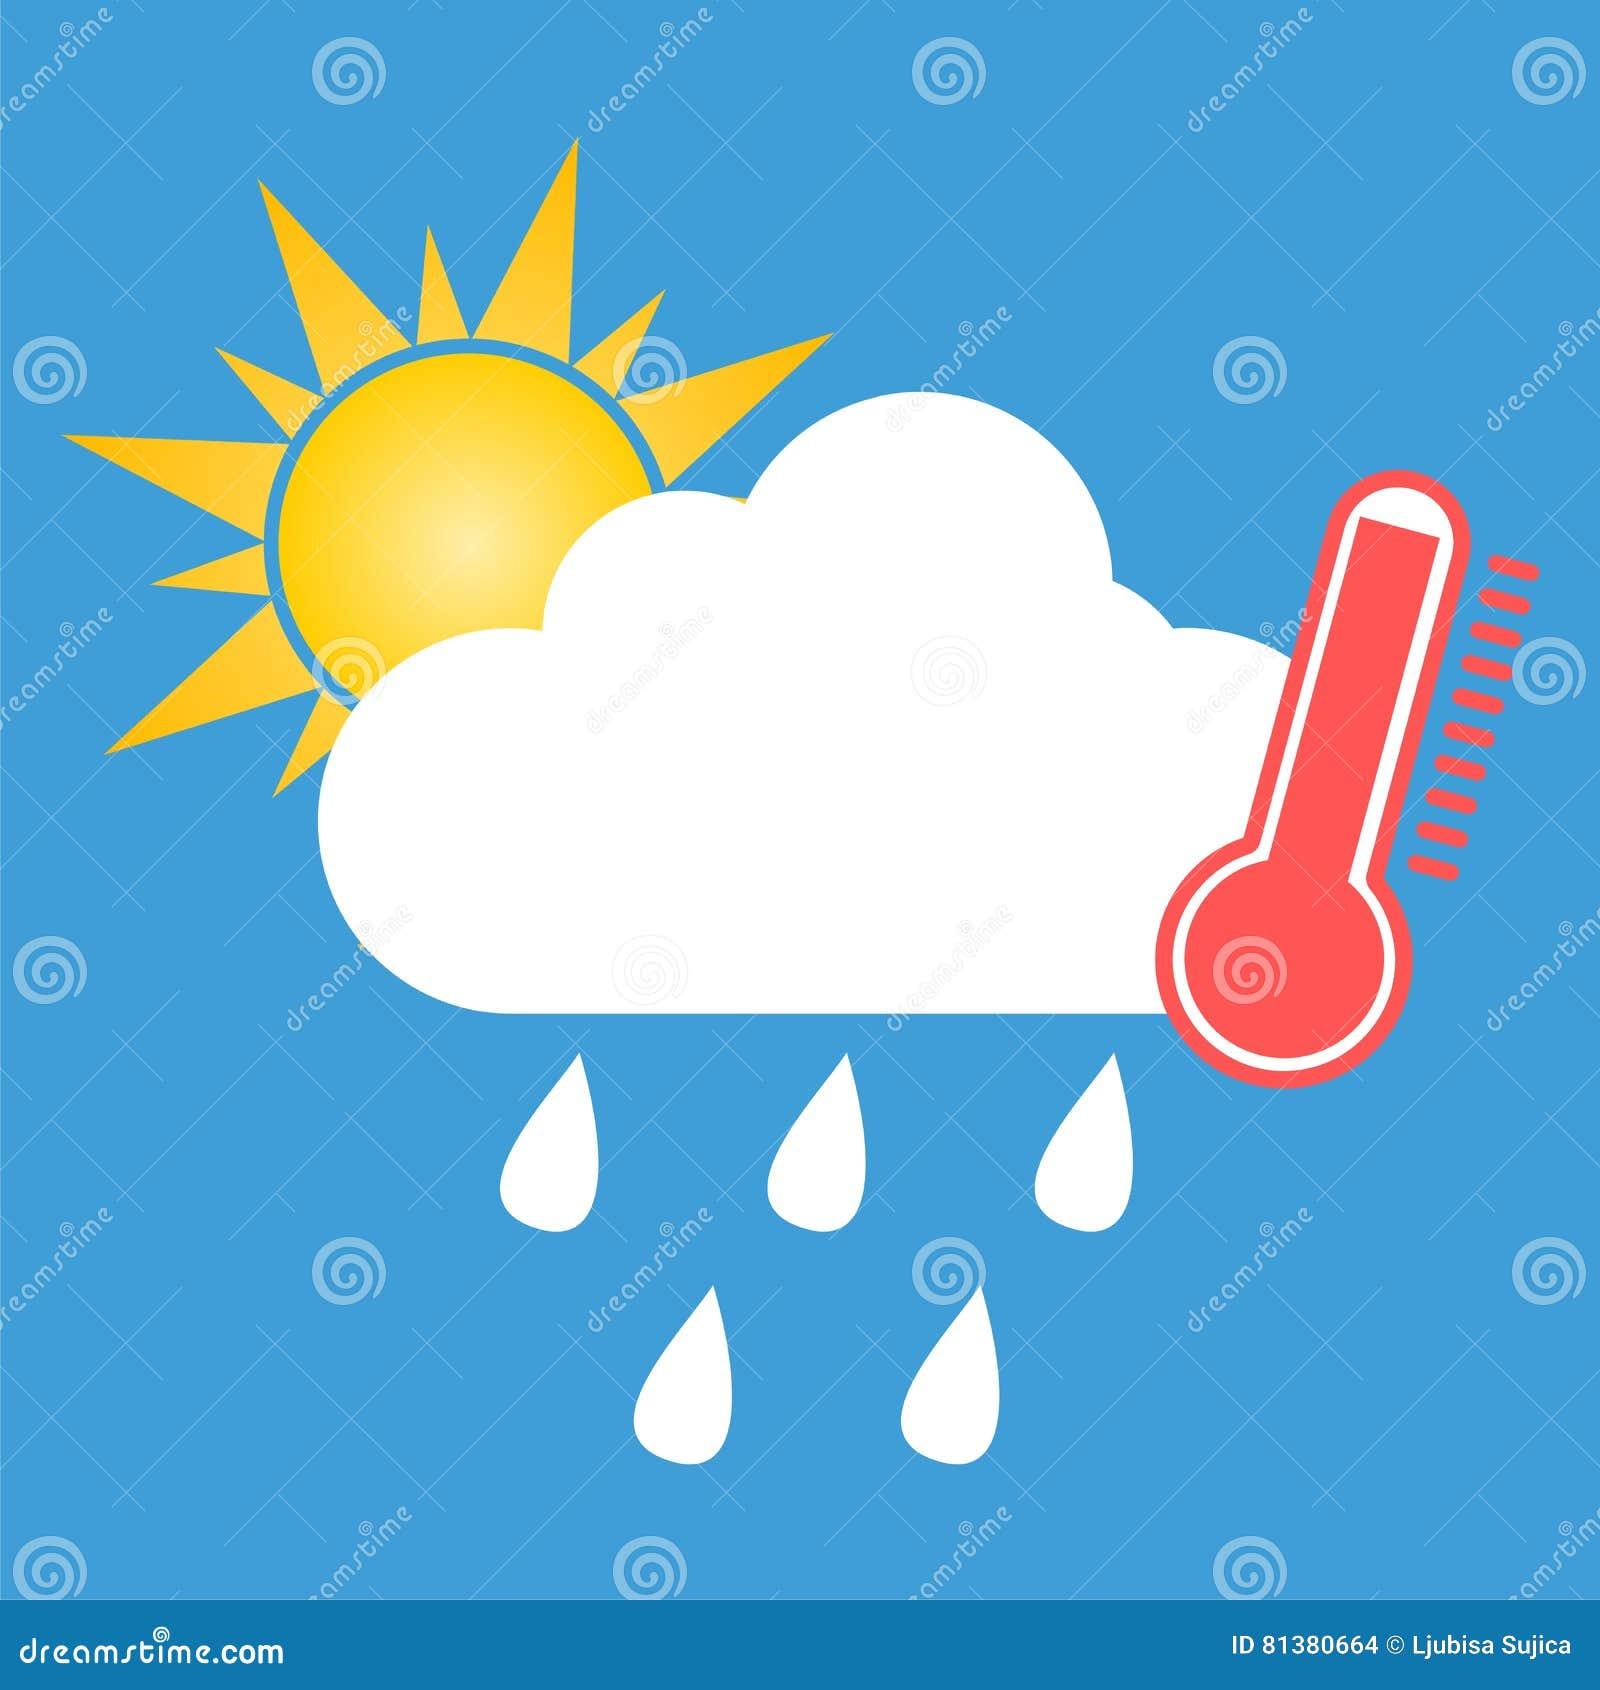 Weather Symbol Hot And Rain Stock Vector Illustration Of Rain